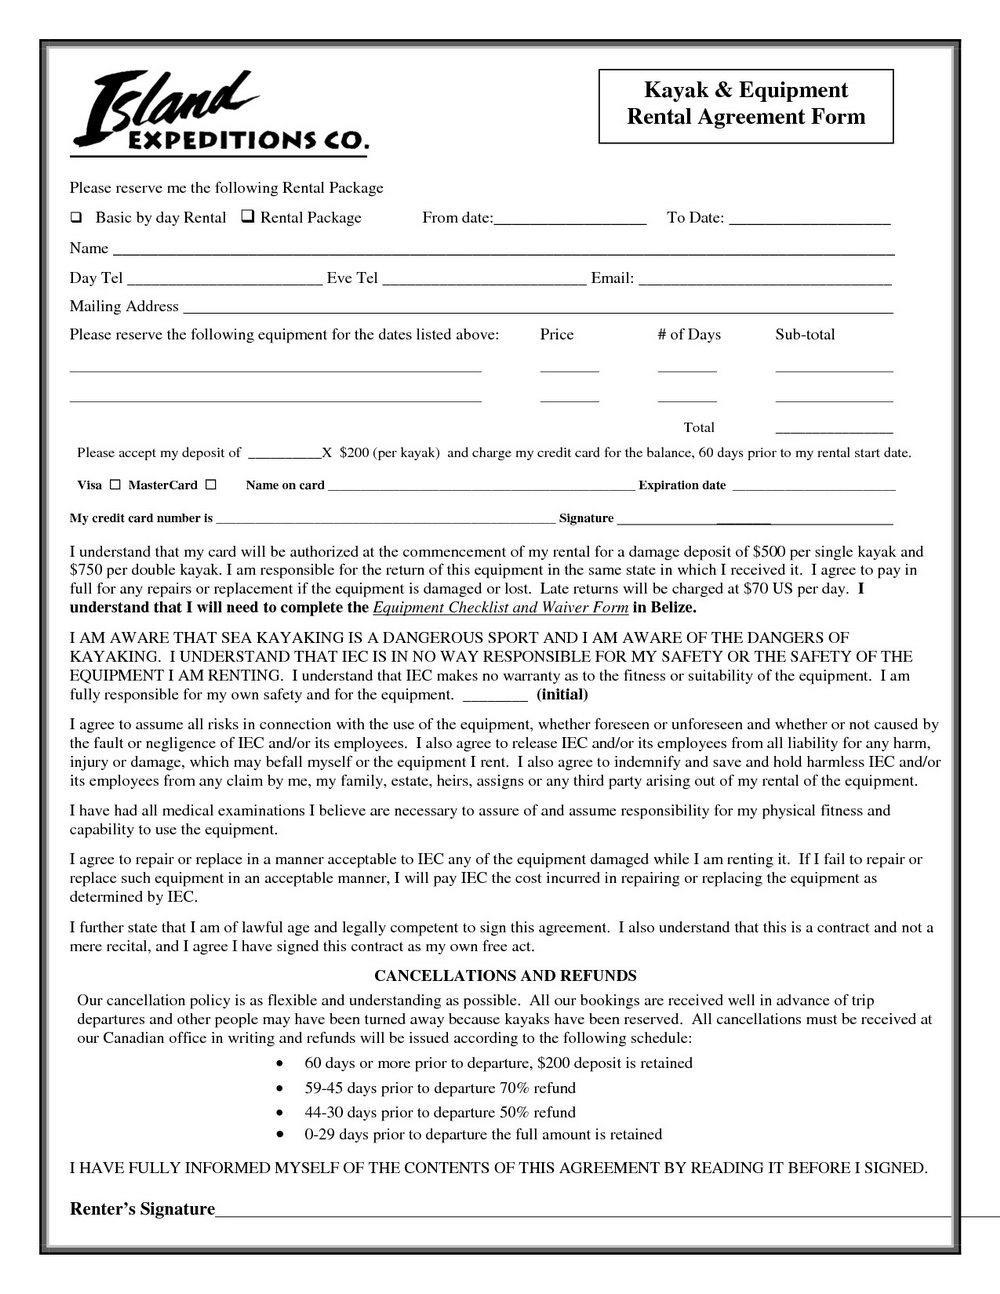 Equipment Rental Agreement Examples